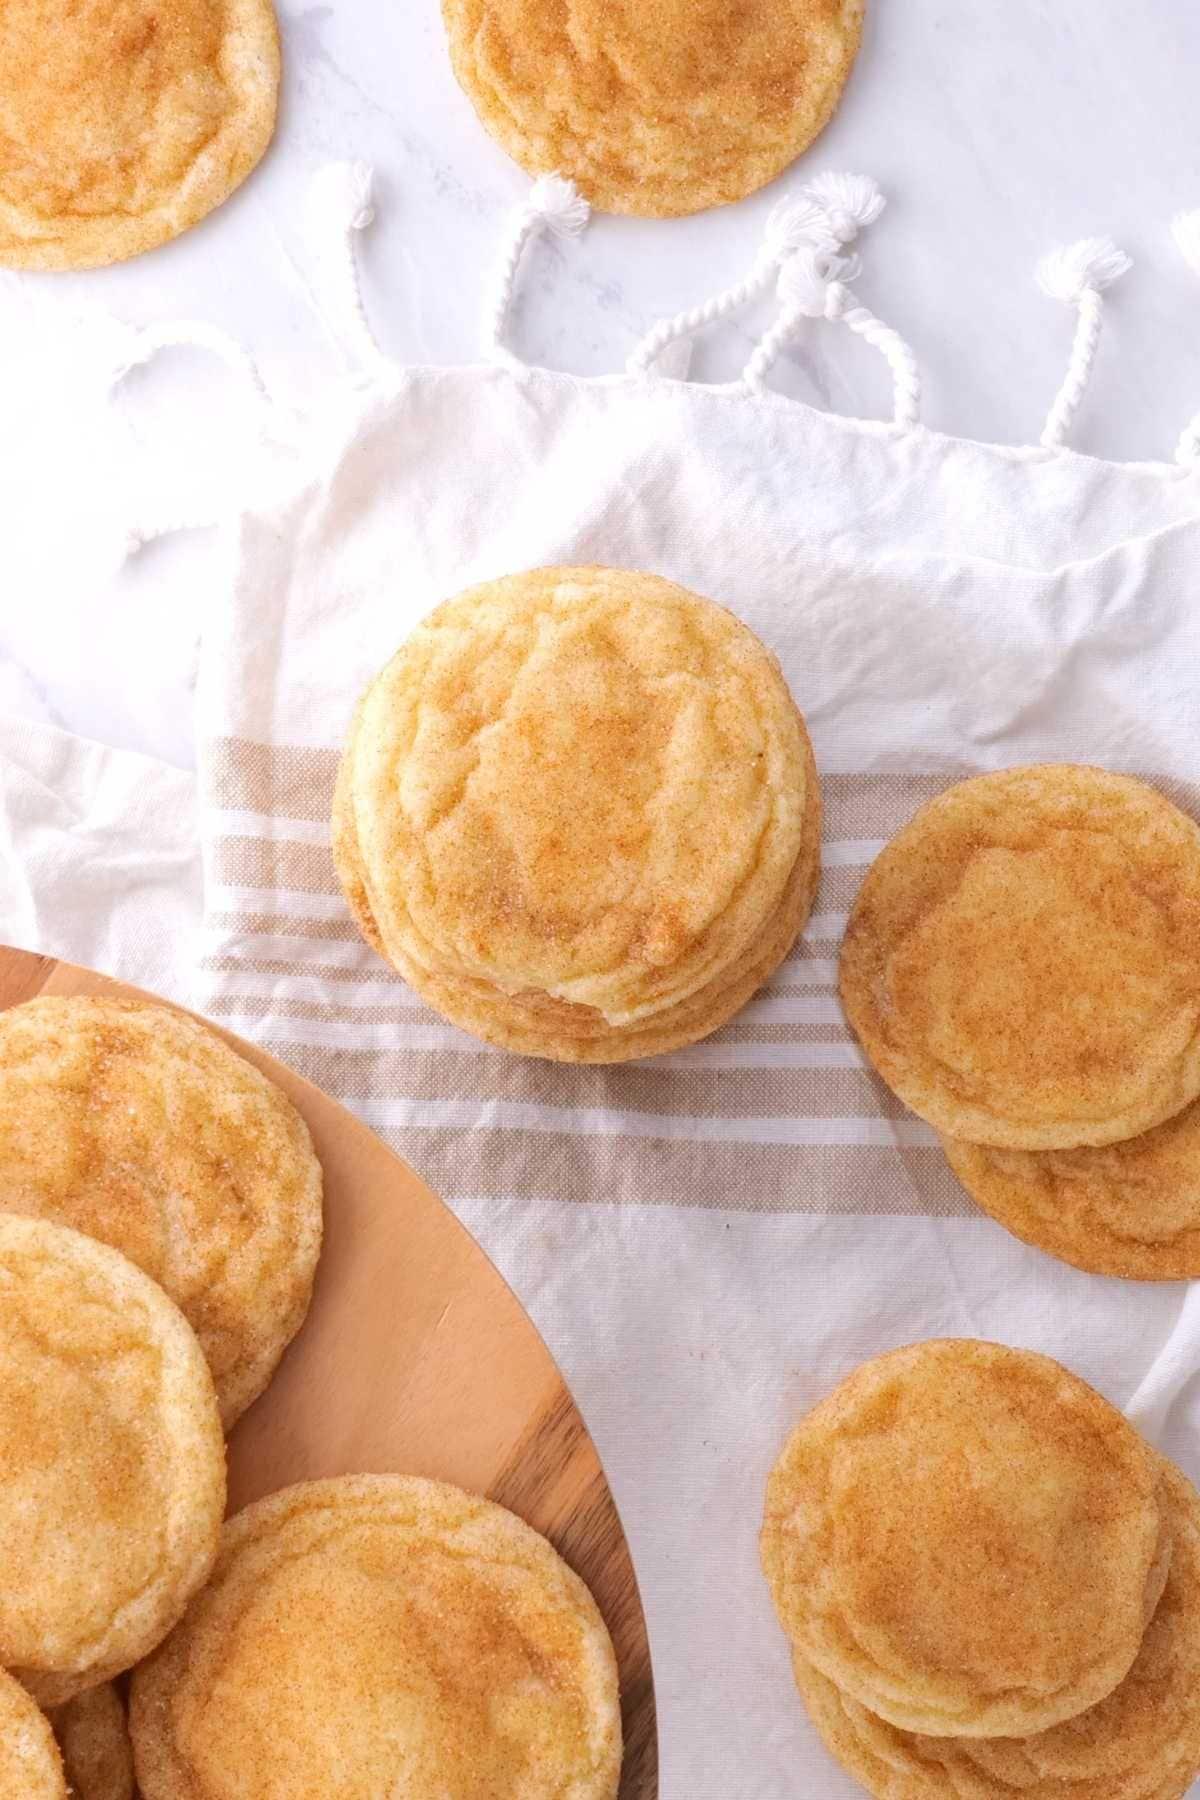 Snickerdoodle Cookies on serving board